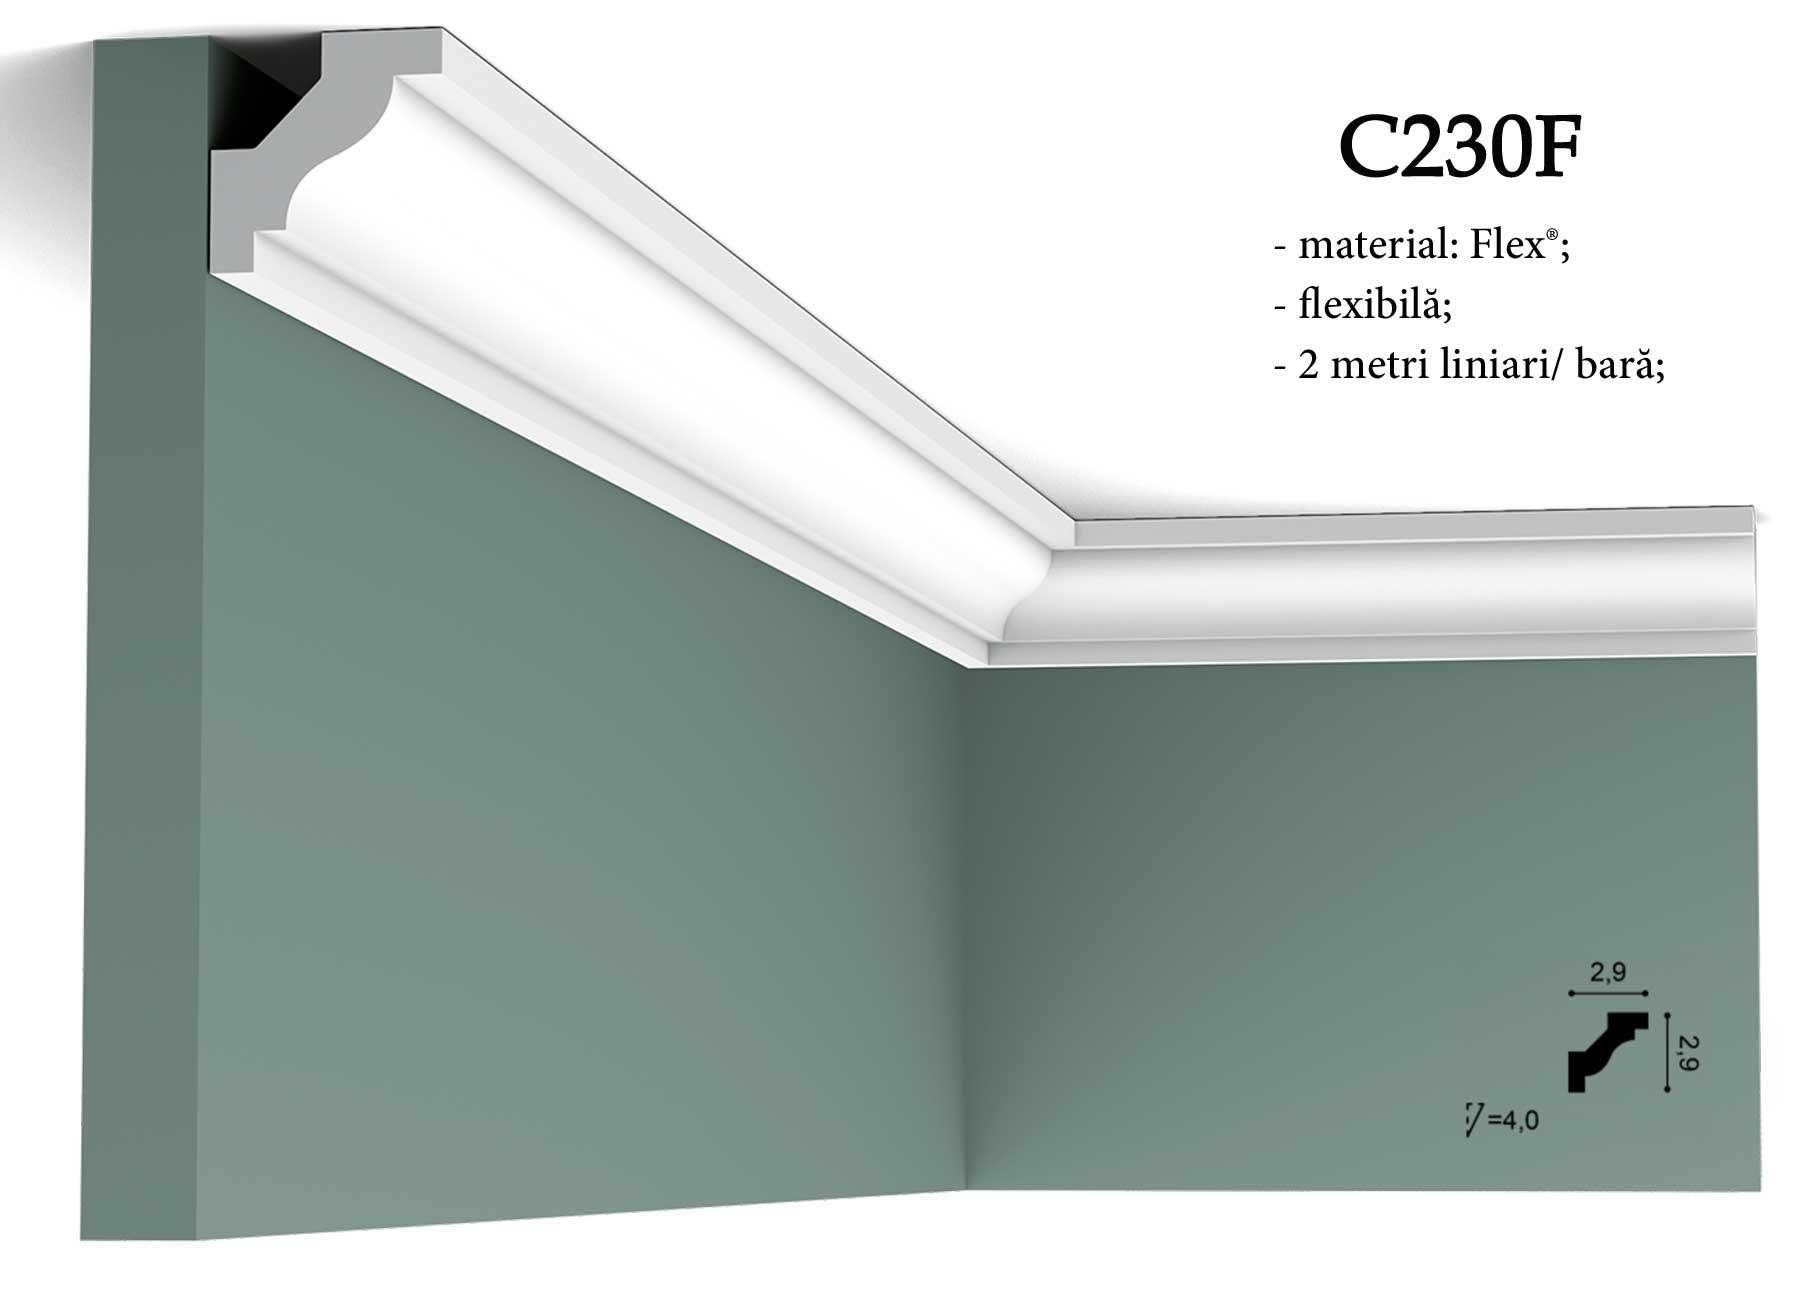 Cornisa flexibila pentru tavan Orac Decor C230F